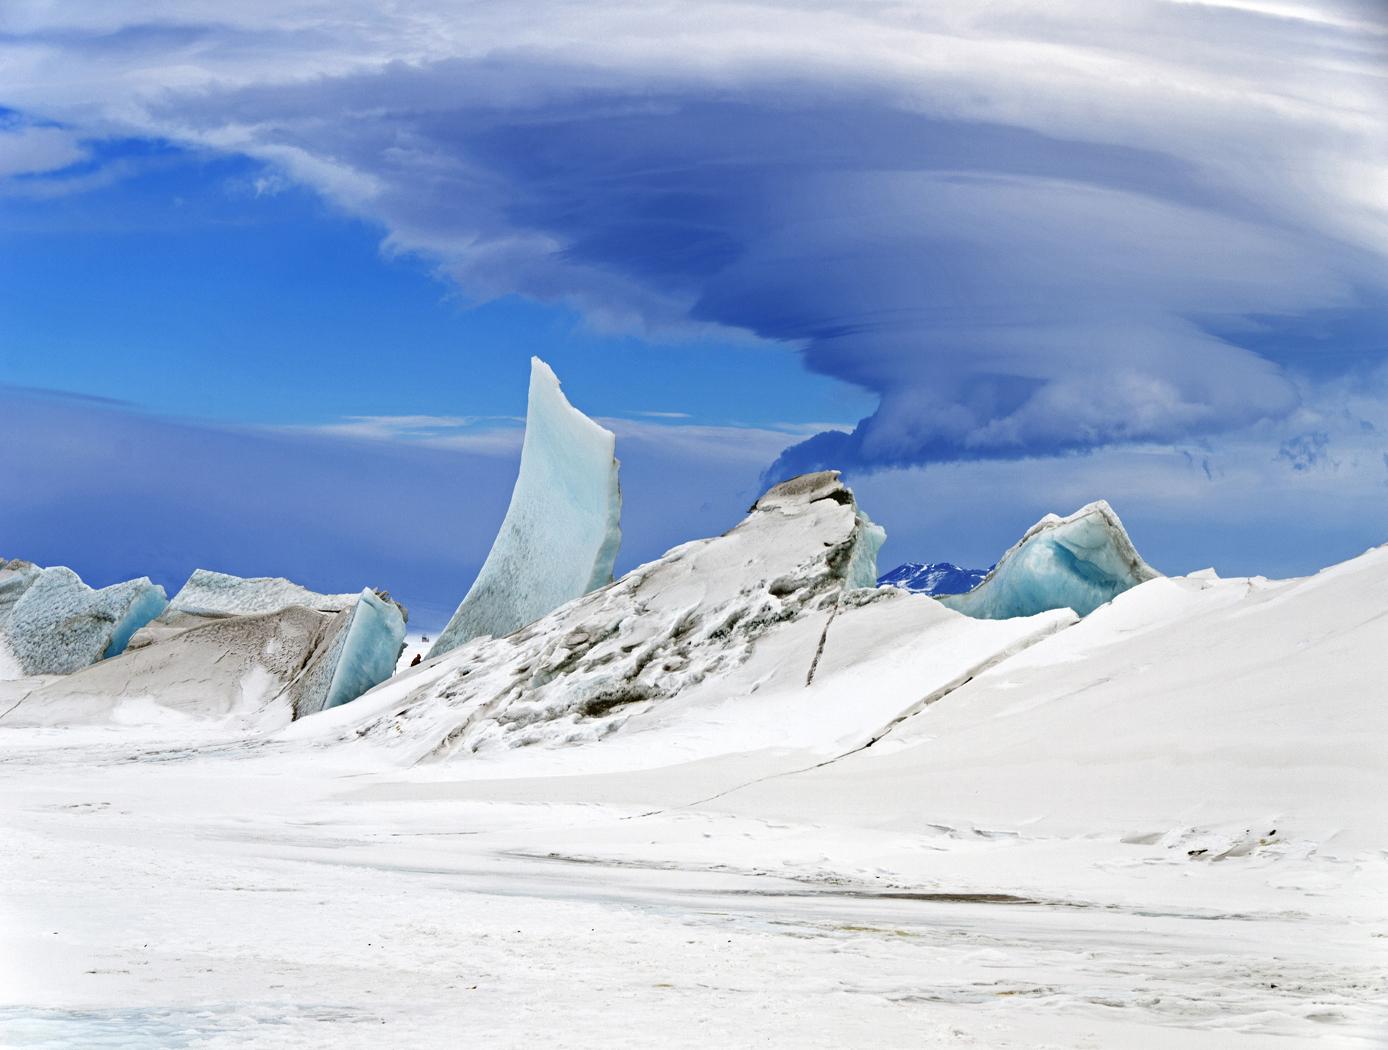 NASA short ice-surveying mission in Antarctica